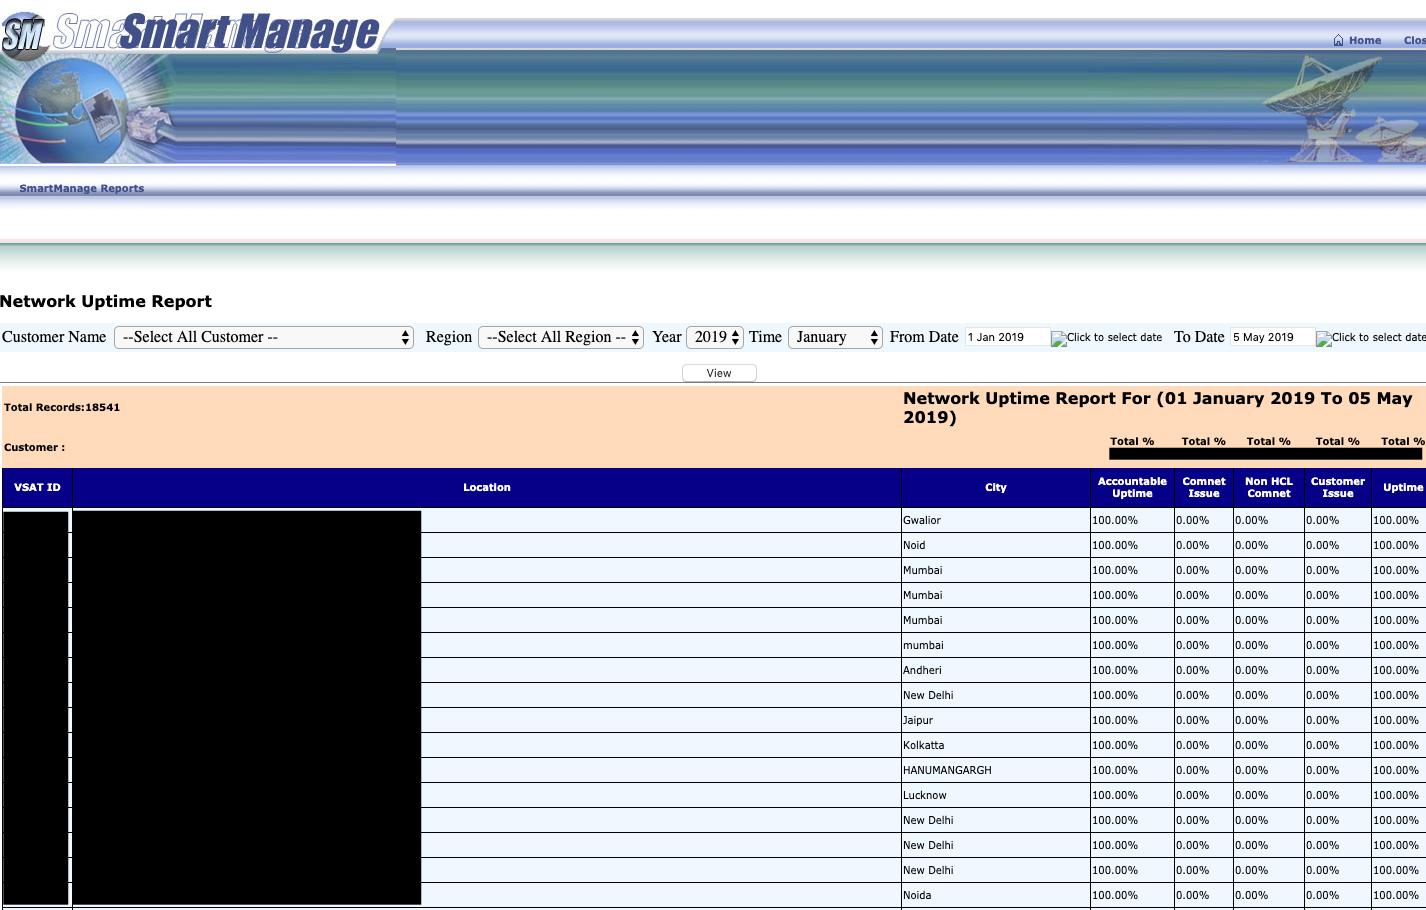 redacted network uptime report